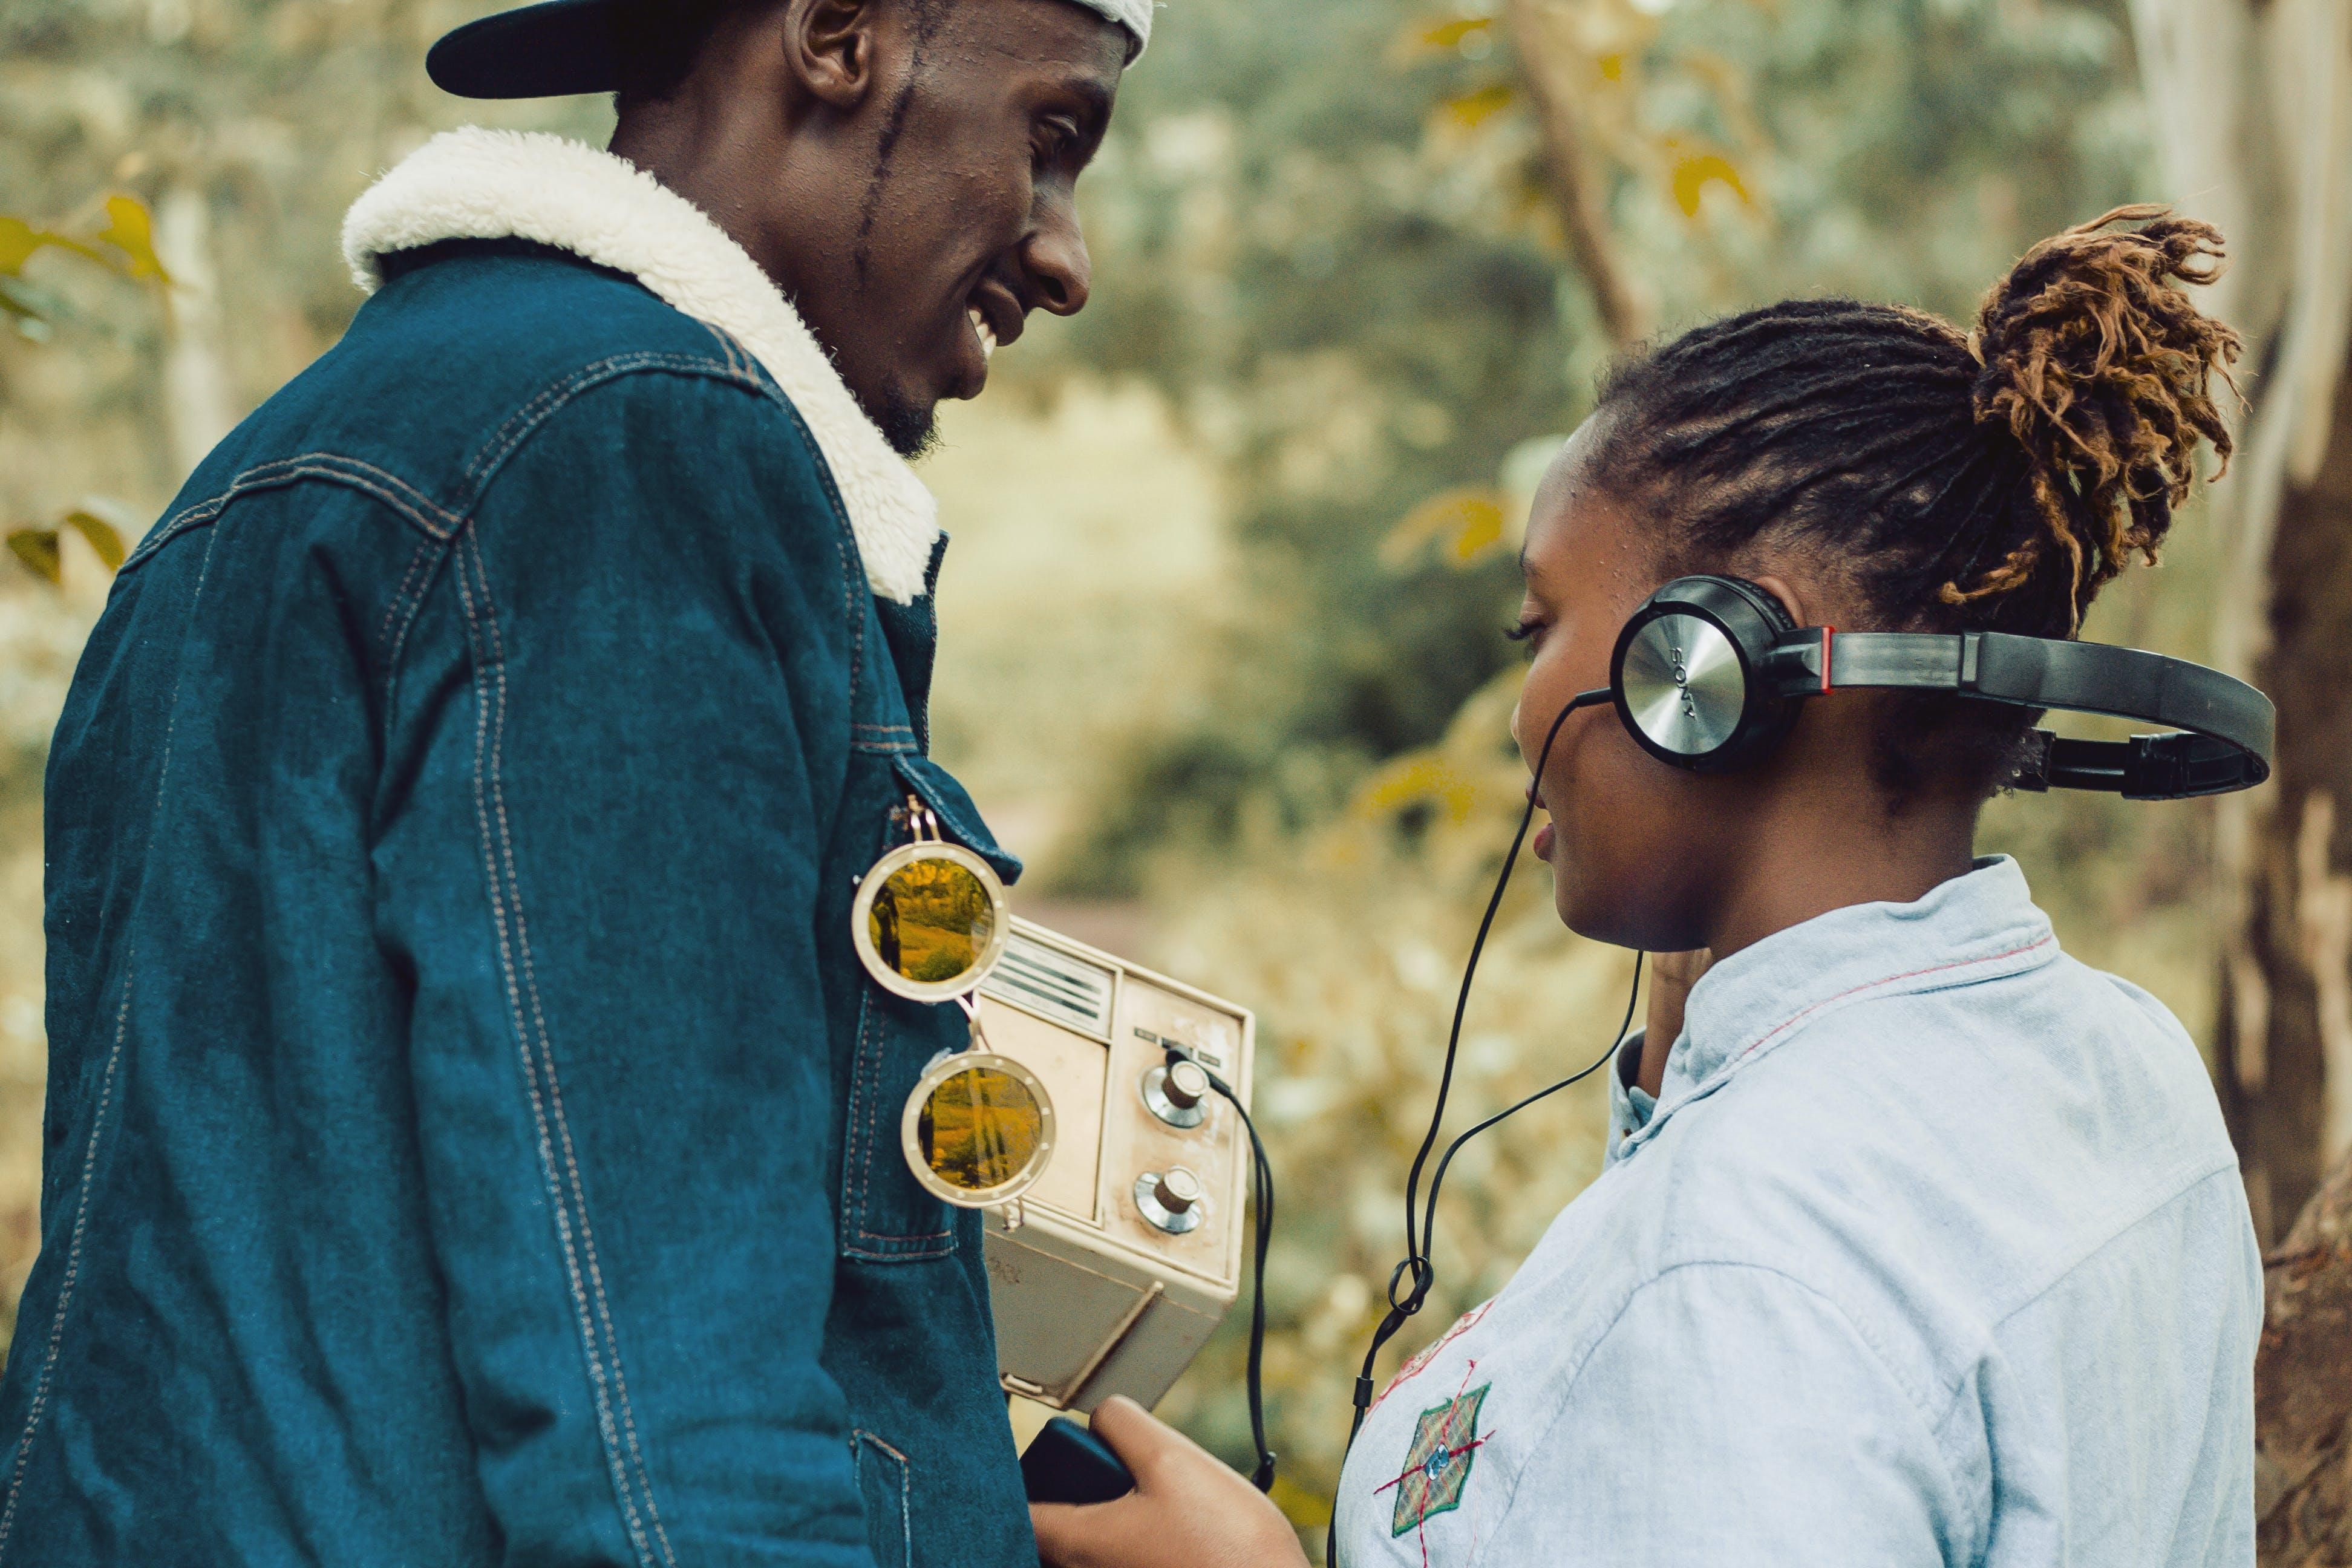 Woman Wearing Headphones Standing Beside Man